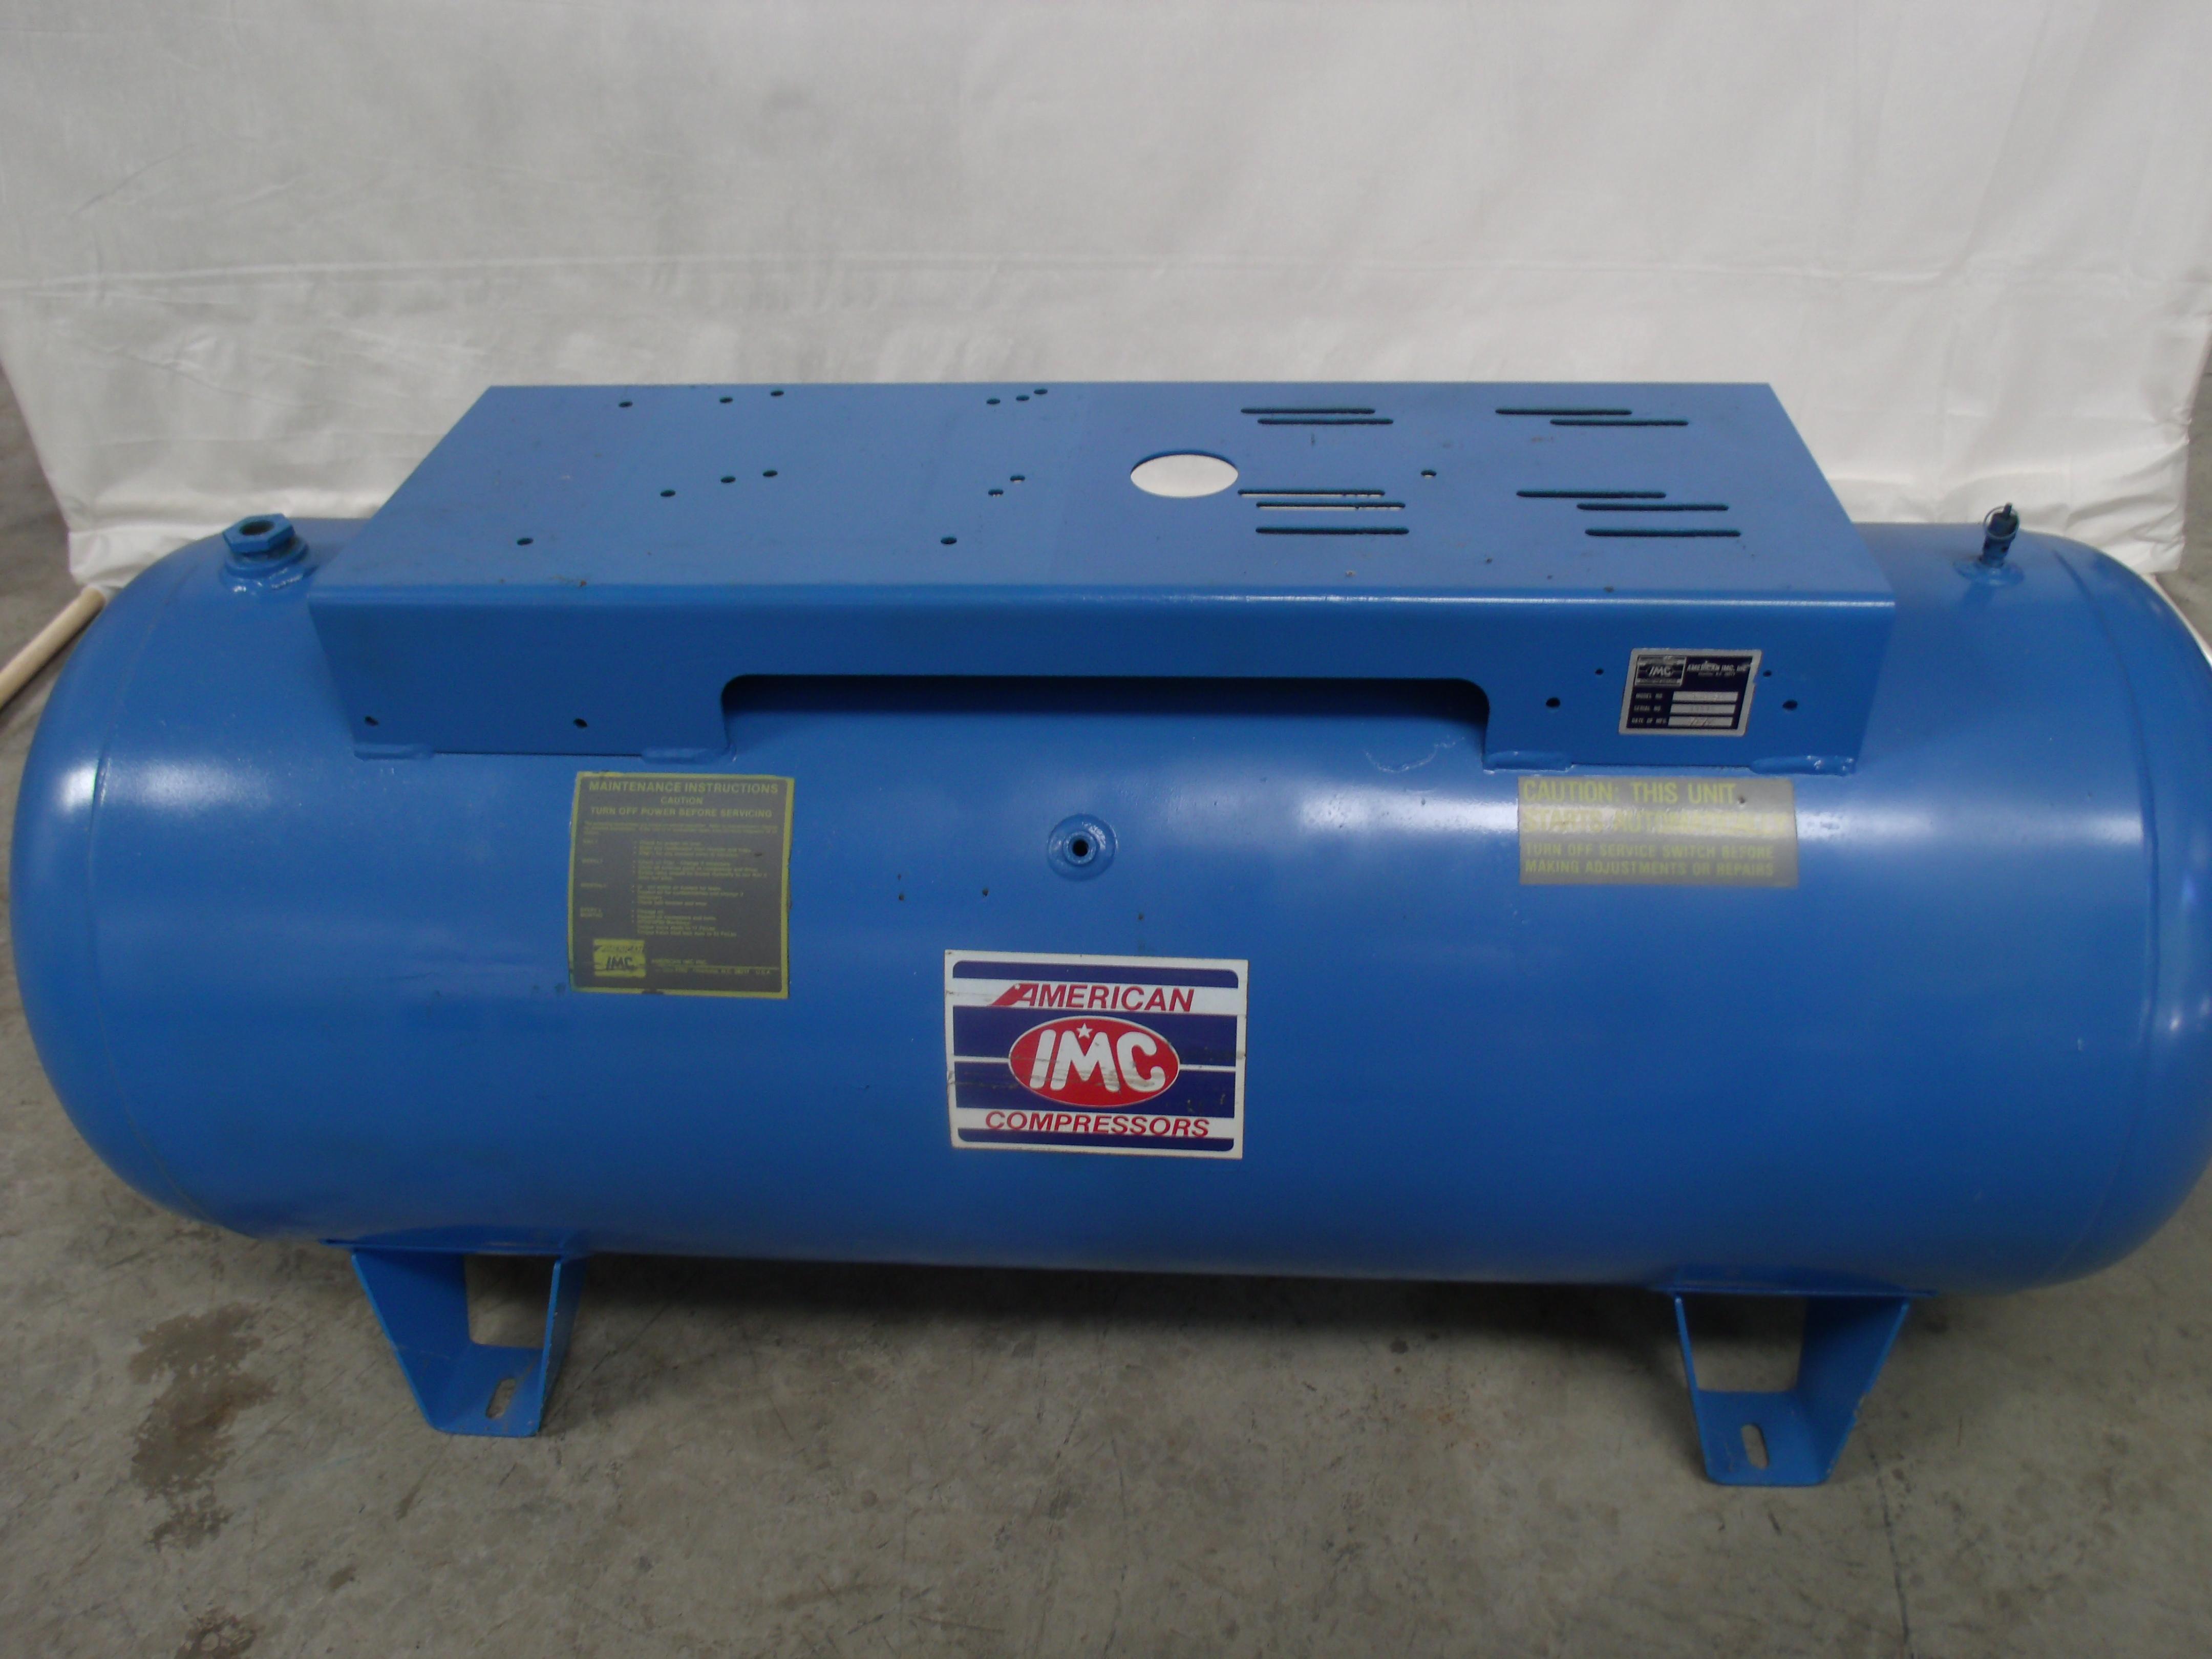 Knockout Pressure Tank American Imc Compressor Tank